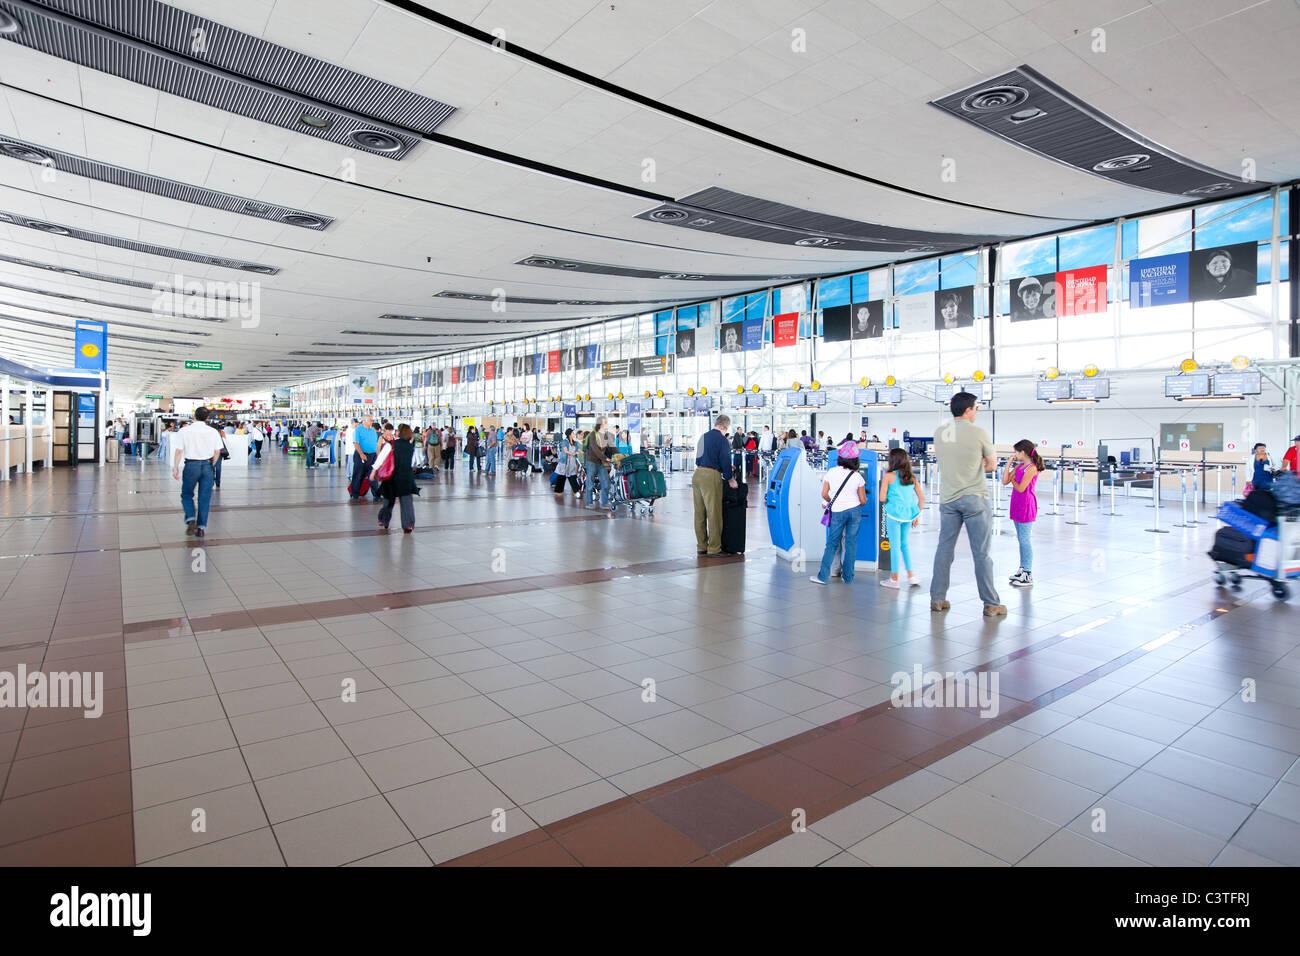 Arturo Merino Benitez International Airport, Santiago, Chile - Stock Image